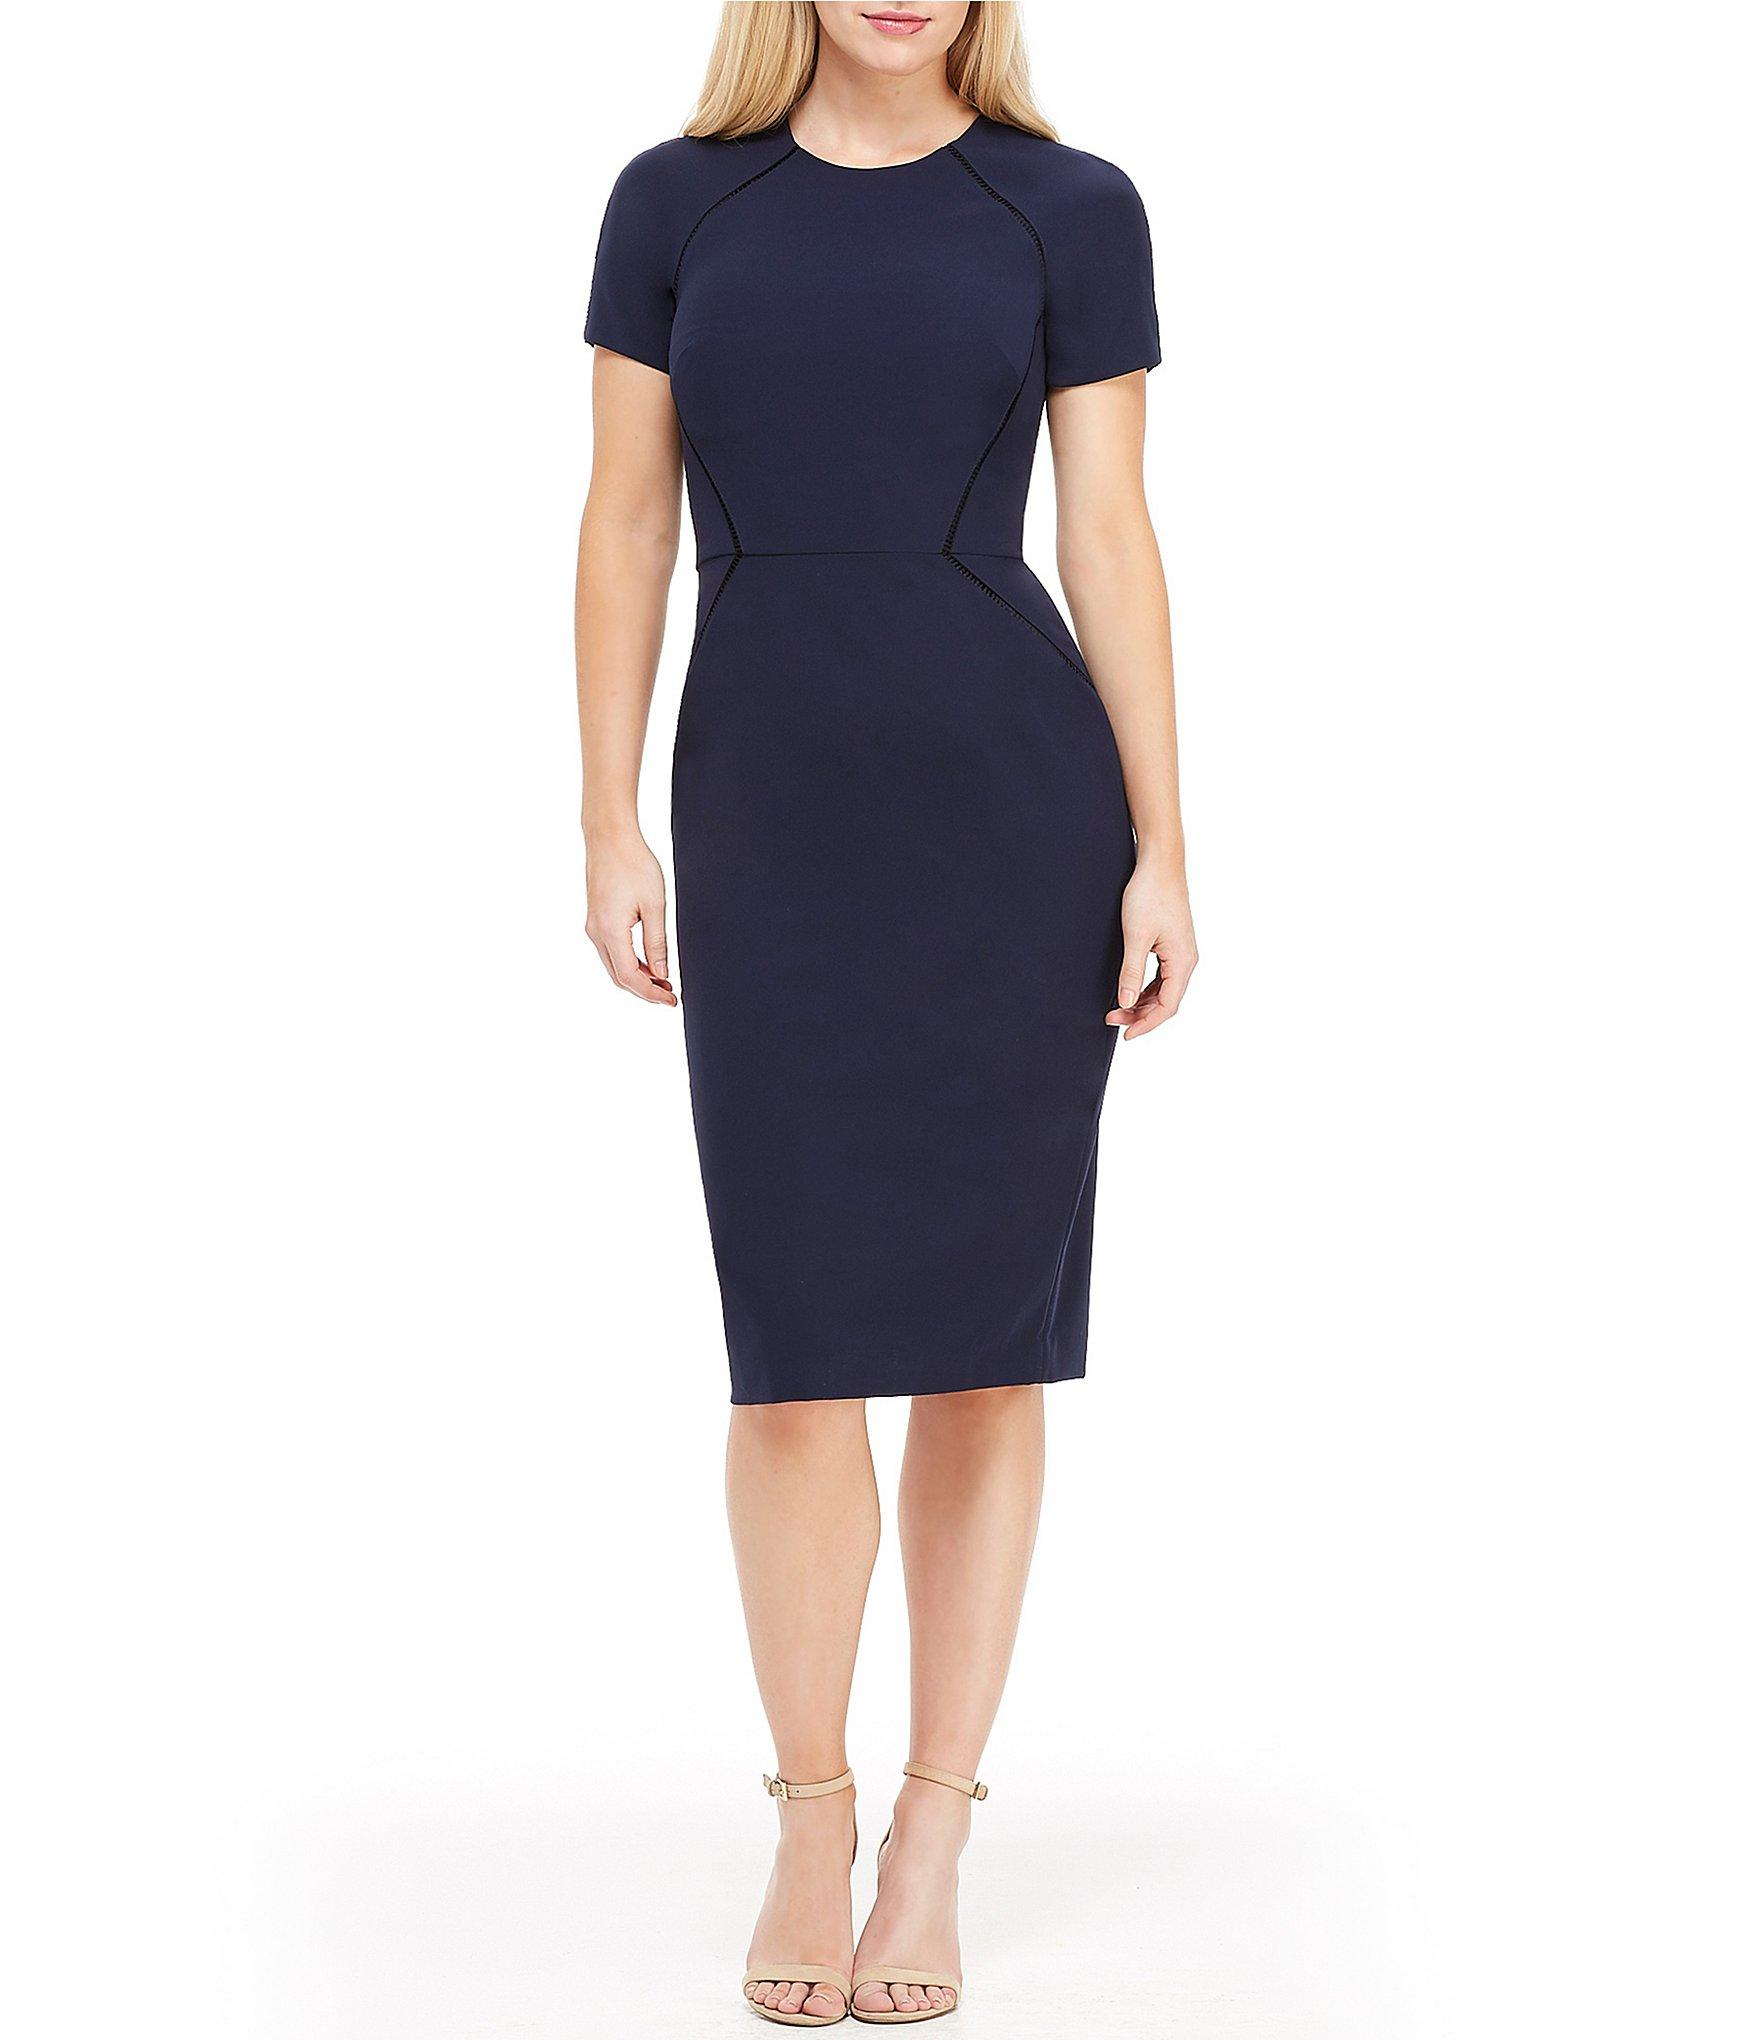 da3fa53b353 Lyst - Maggy London Crepe Inset Trim Midi Length Sheath Dress in Blue